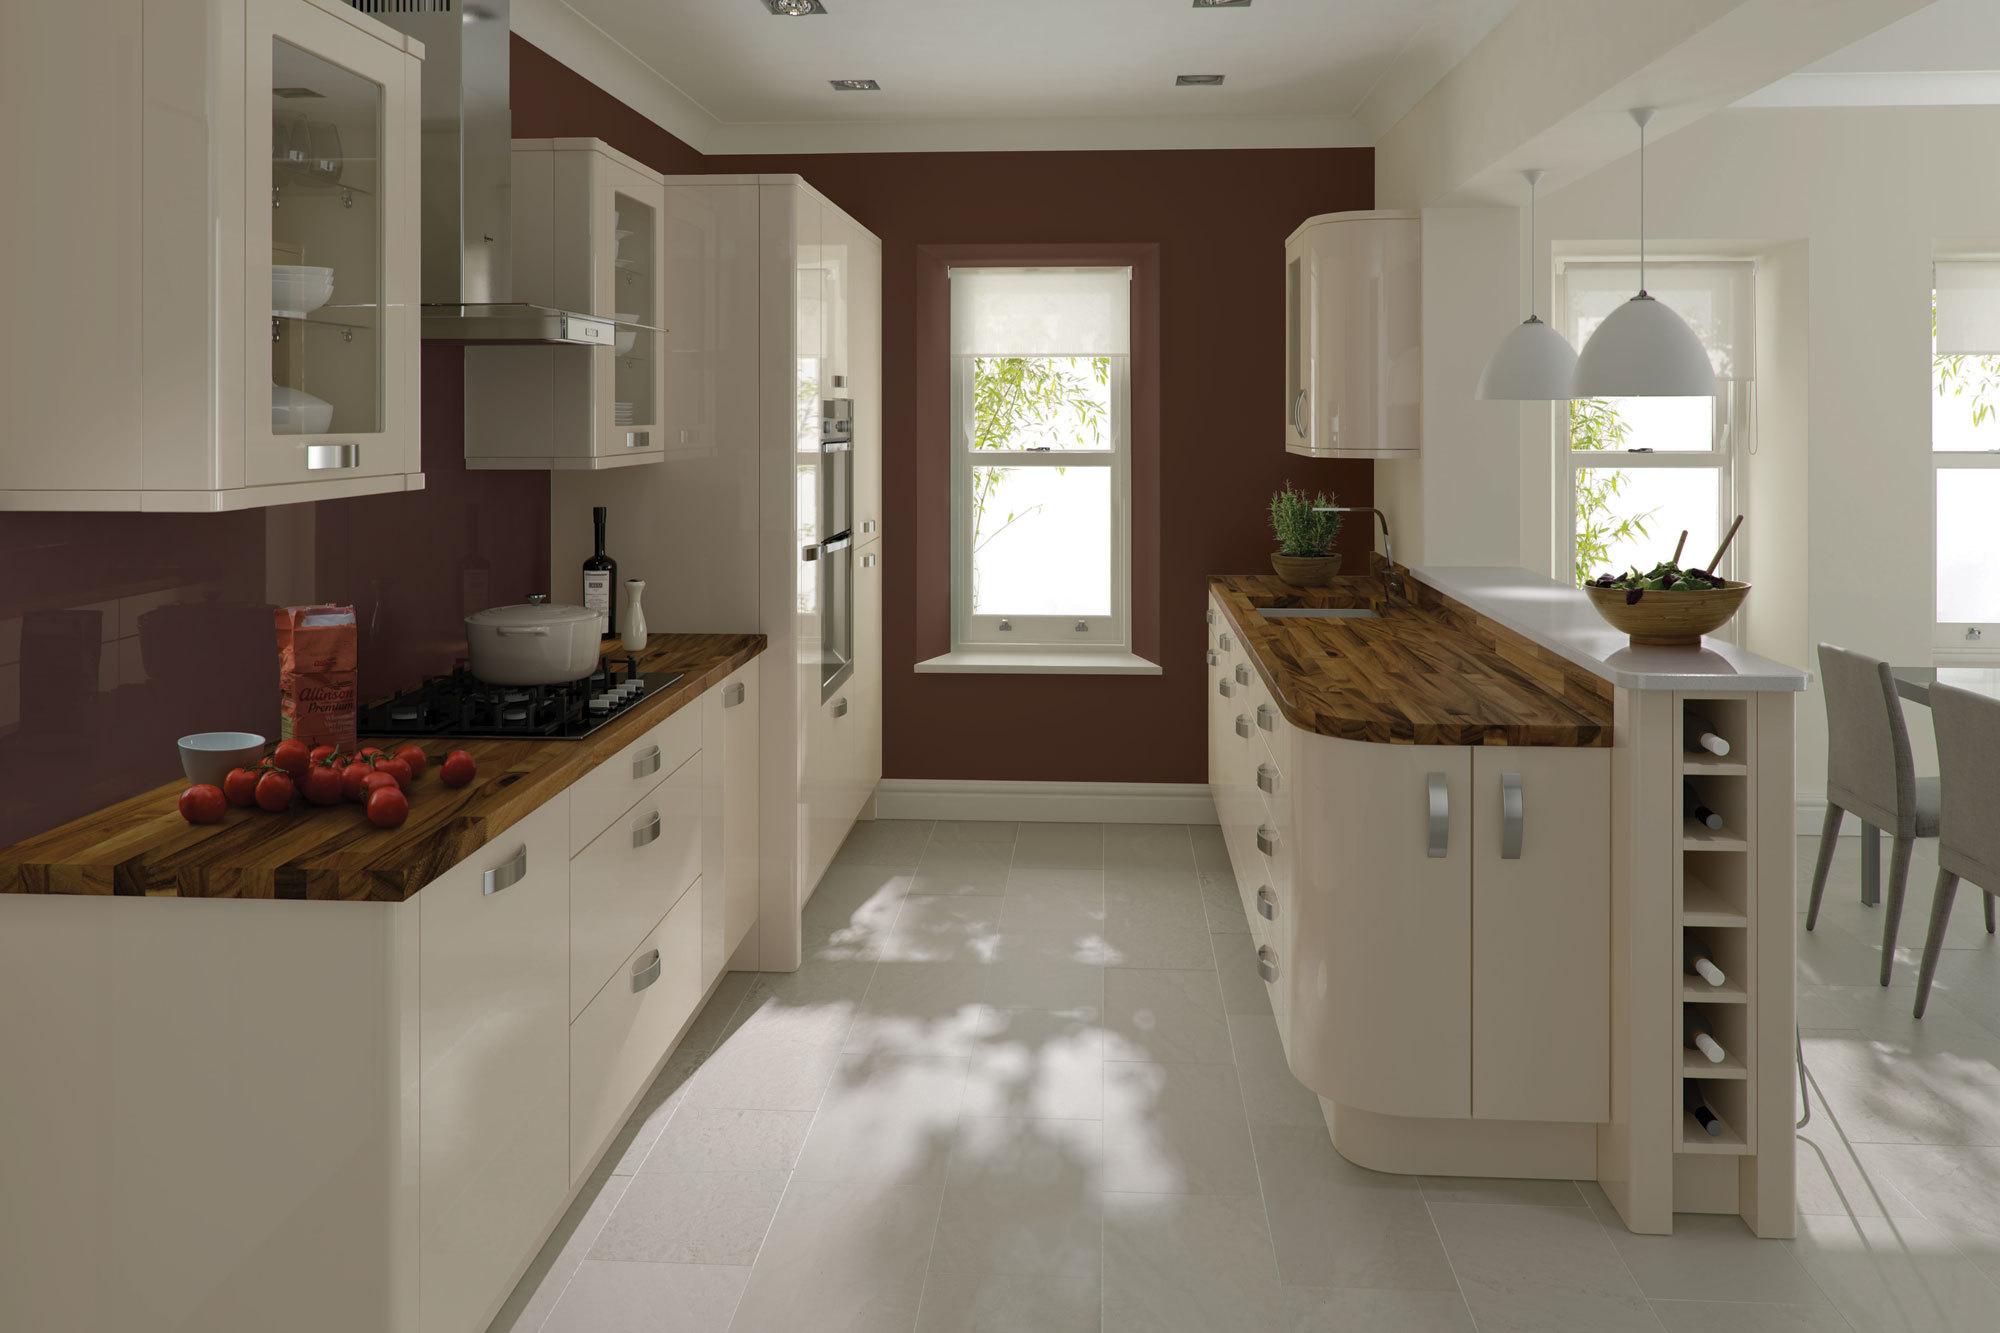 Bespoke furniture | Sunderland | The Kitchen and Bedroom Studio